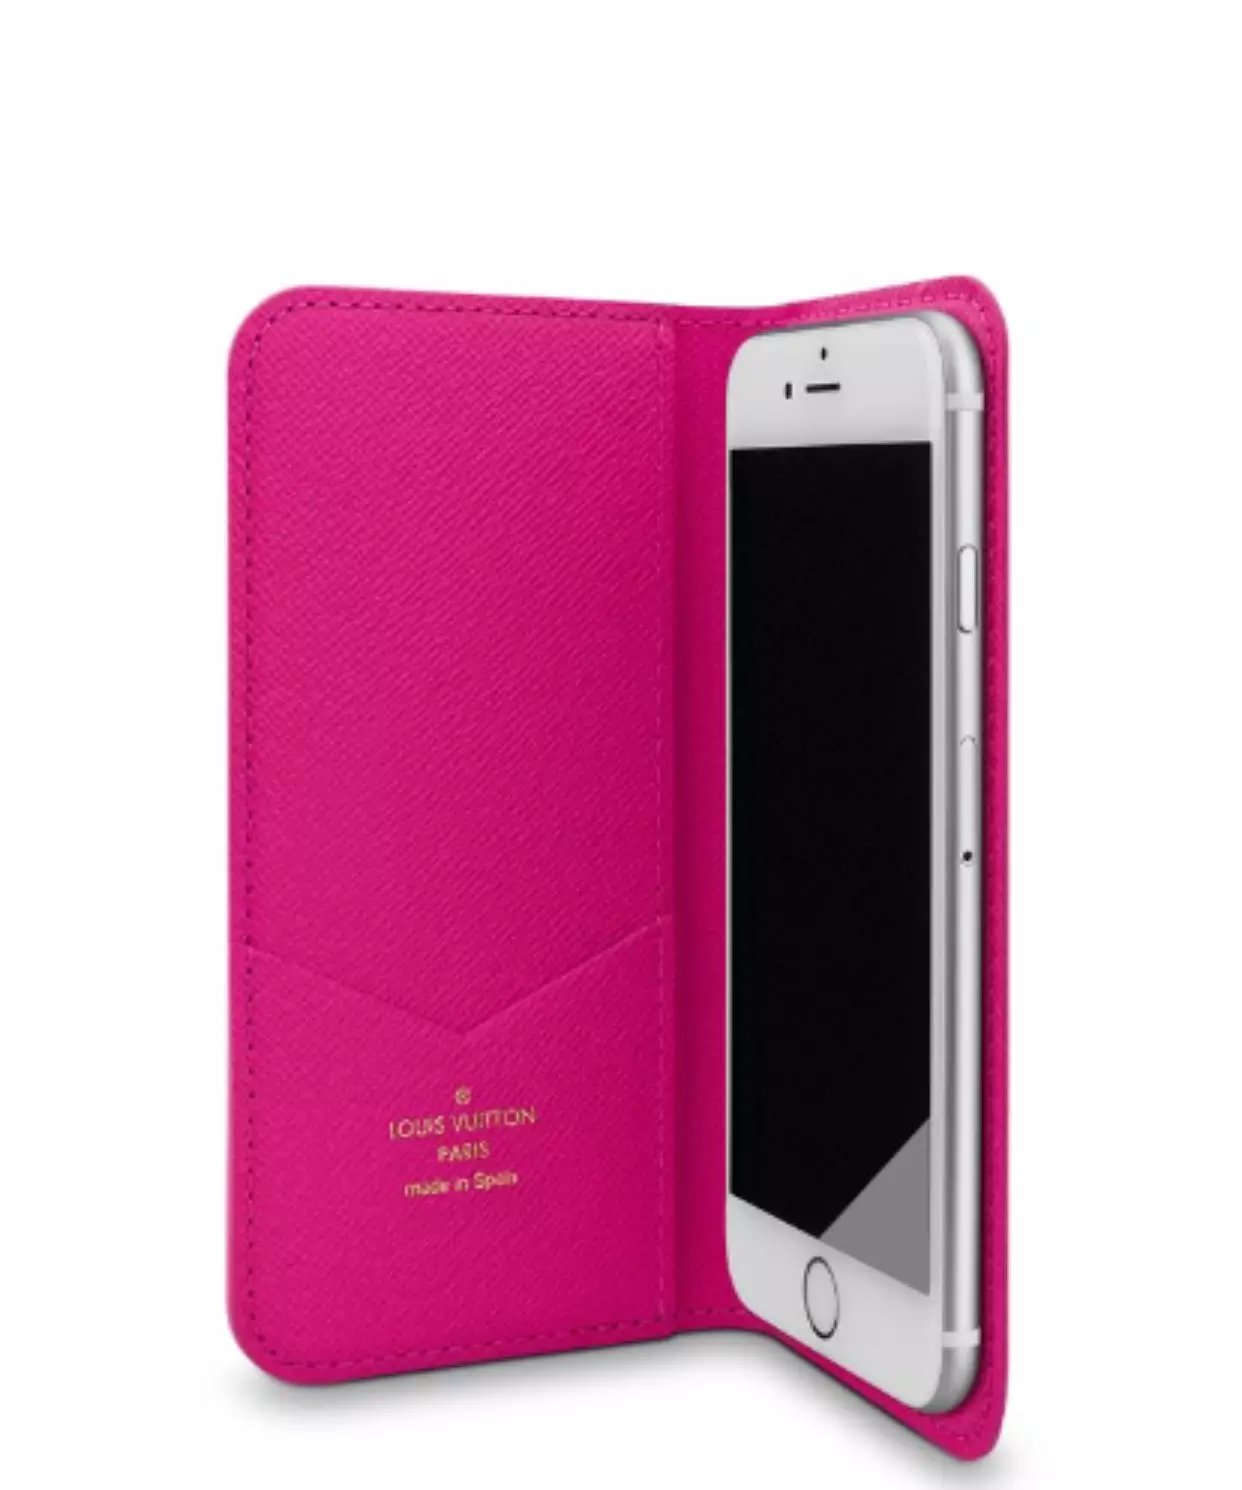 hülle iphone iphone hülle gestalten Louis Vuitton iphone6 hülle iphone 6 ilikonhülle iphone 6 over wech6ln iphone 6 kaufpreis iphone 6 designer hülle iphone 6 zoll display ipod hülle 6lbst gestalten